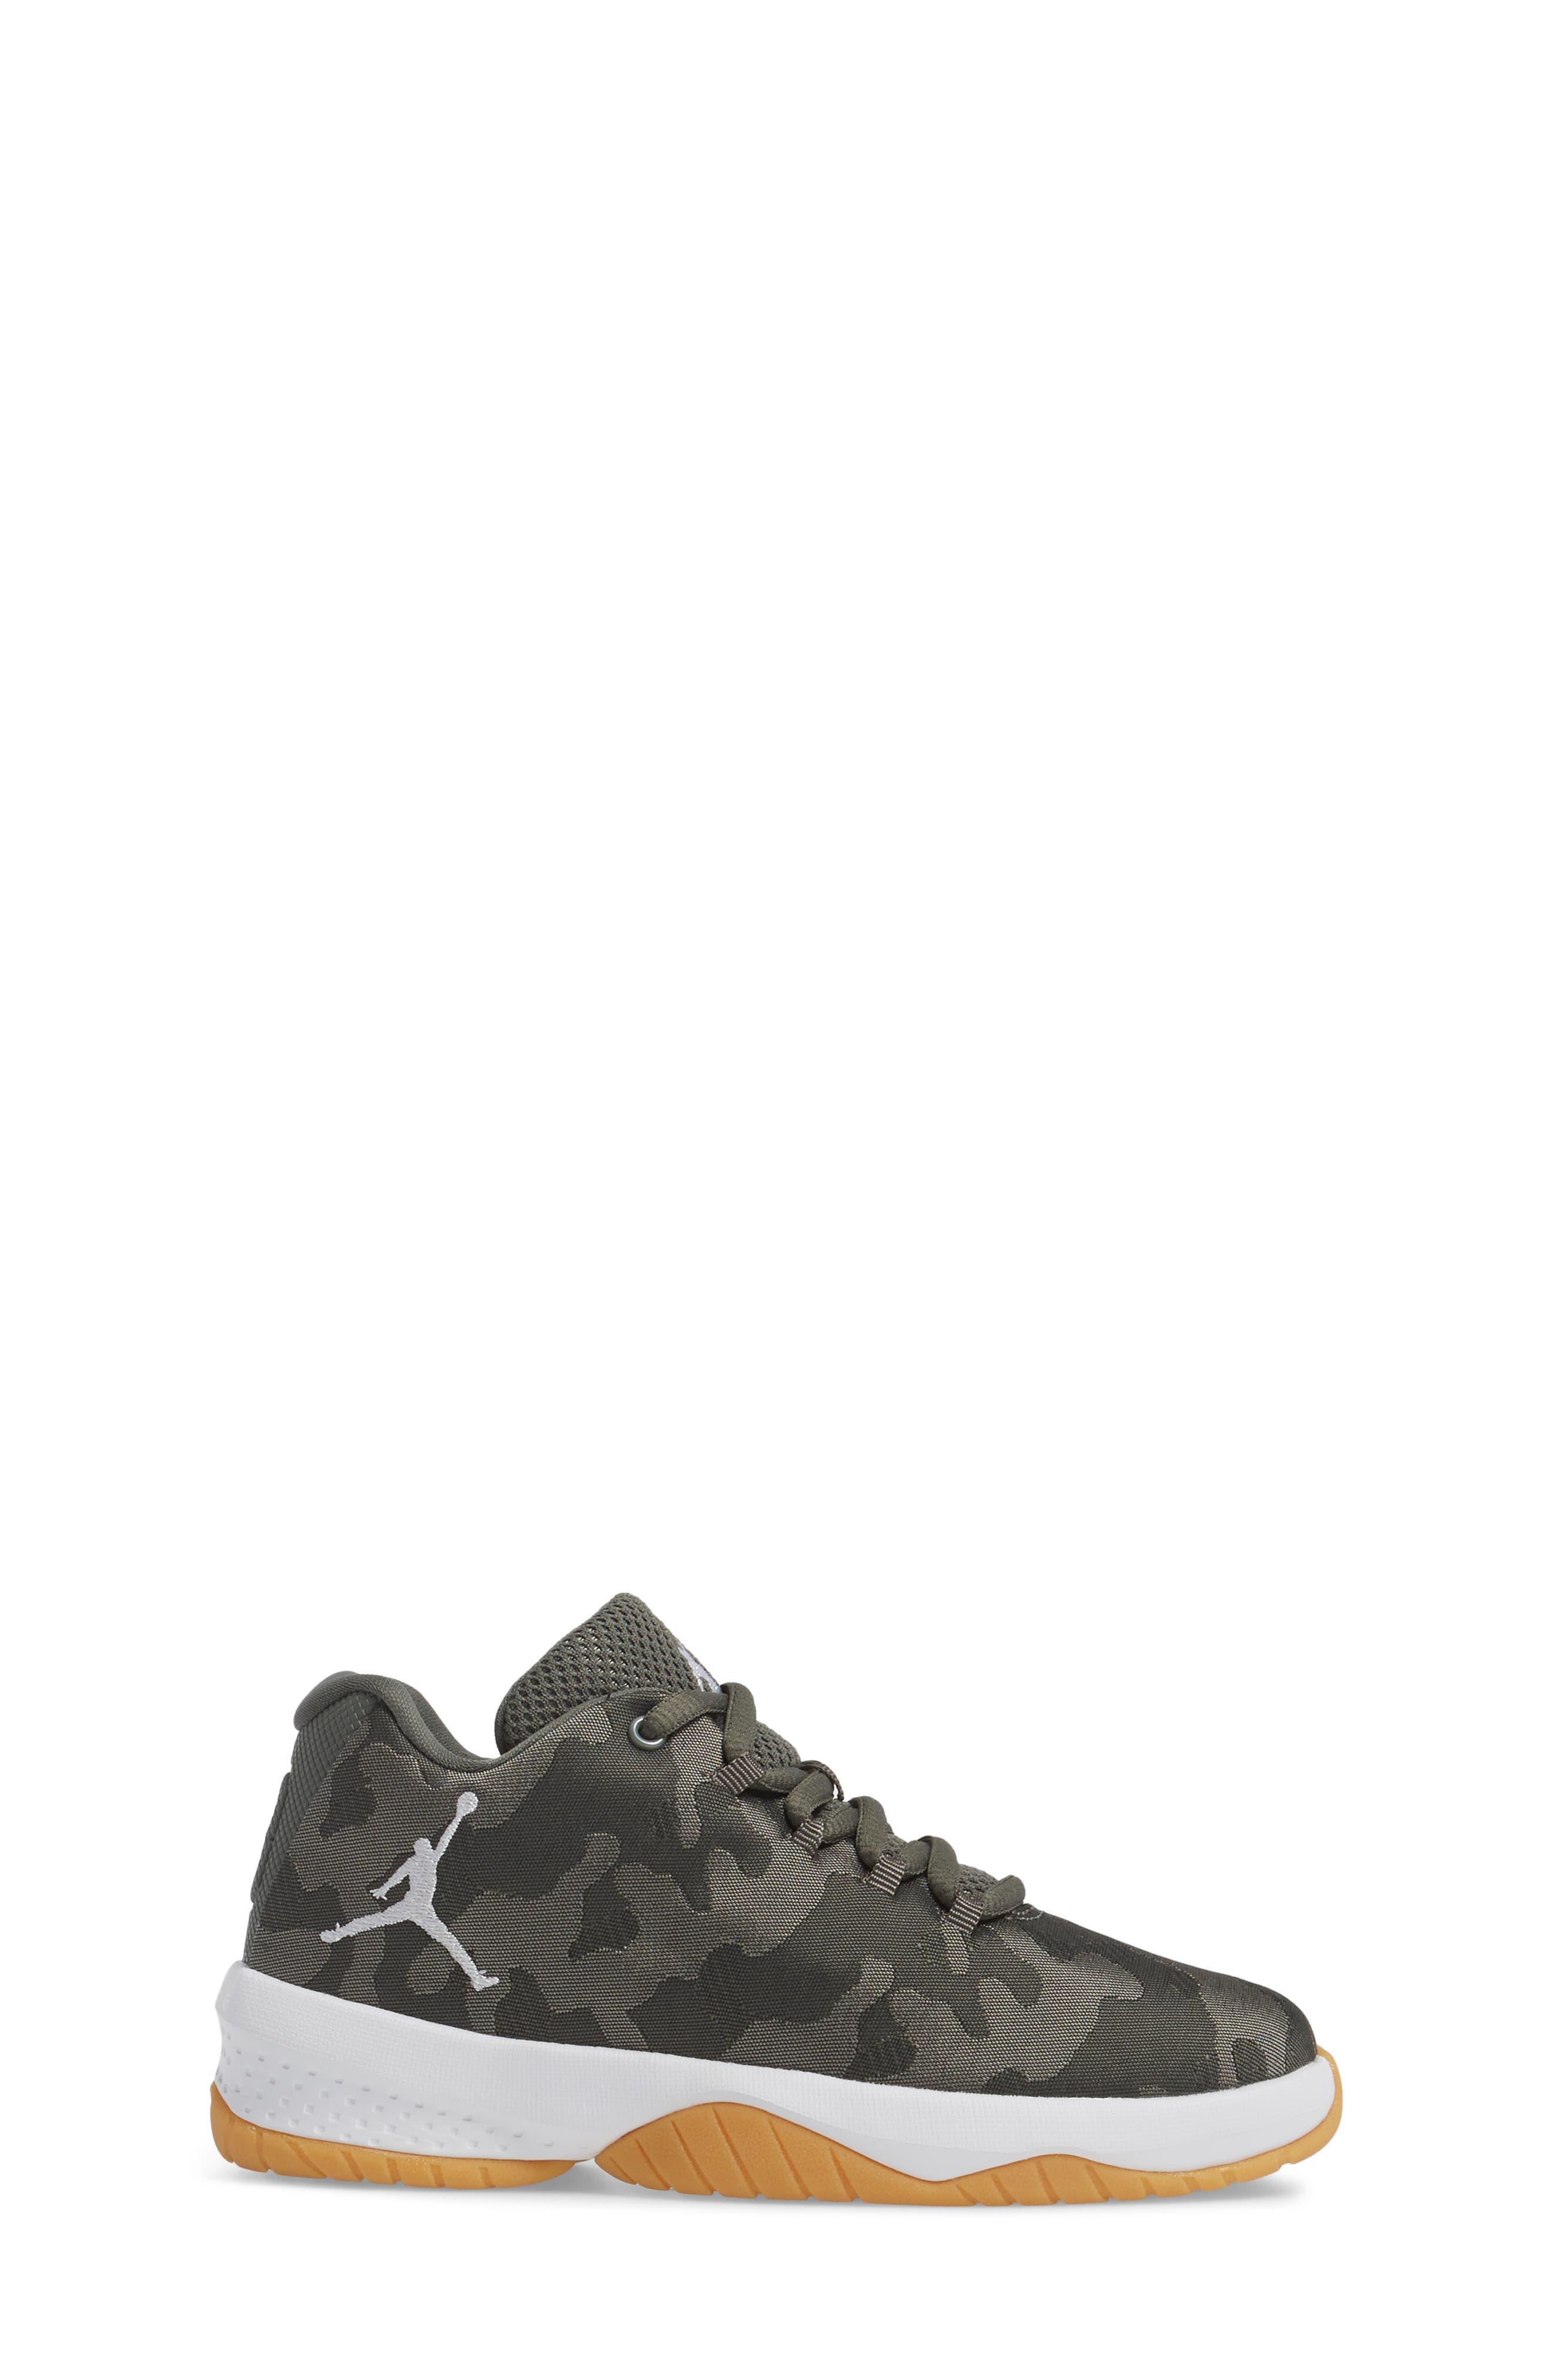 B. Fly Basketball Shoe,                             Alternate thumbnail 3, color,                             250